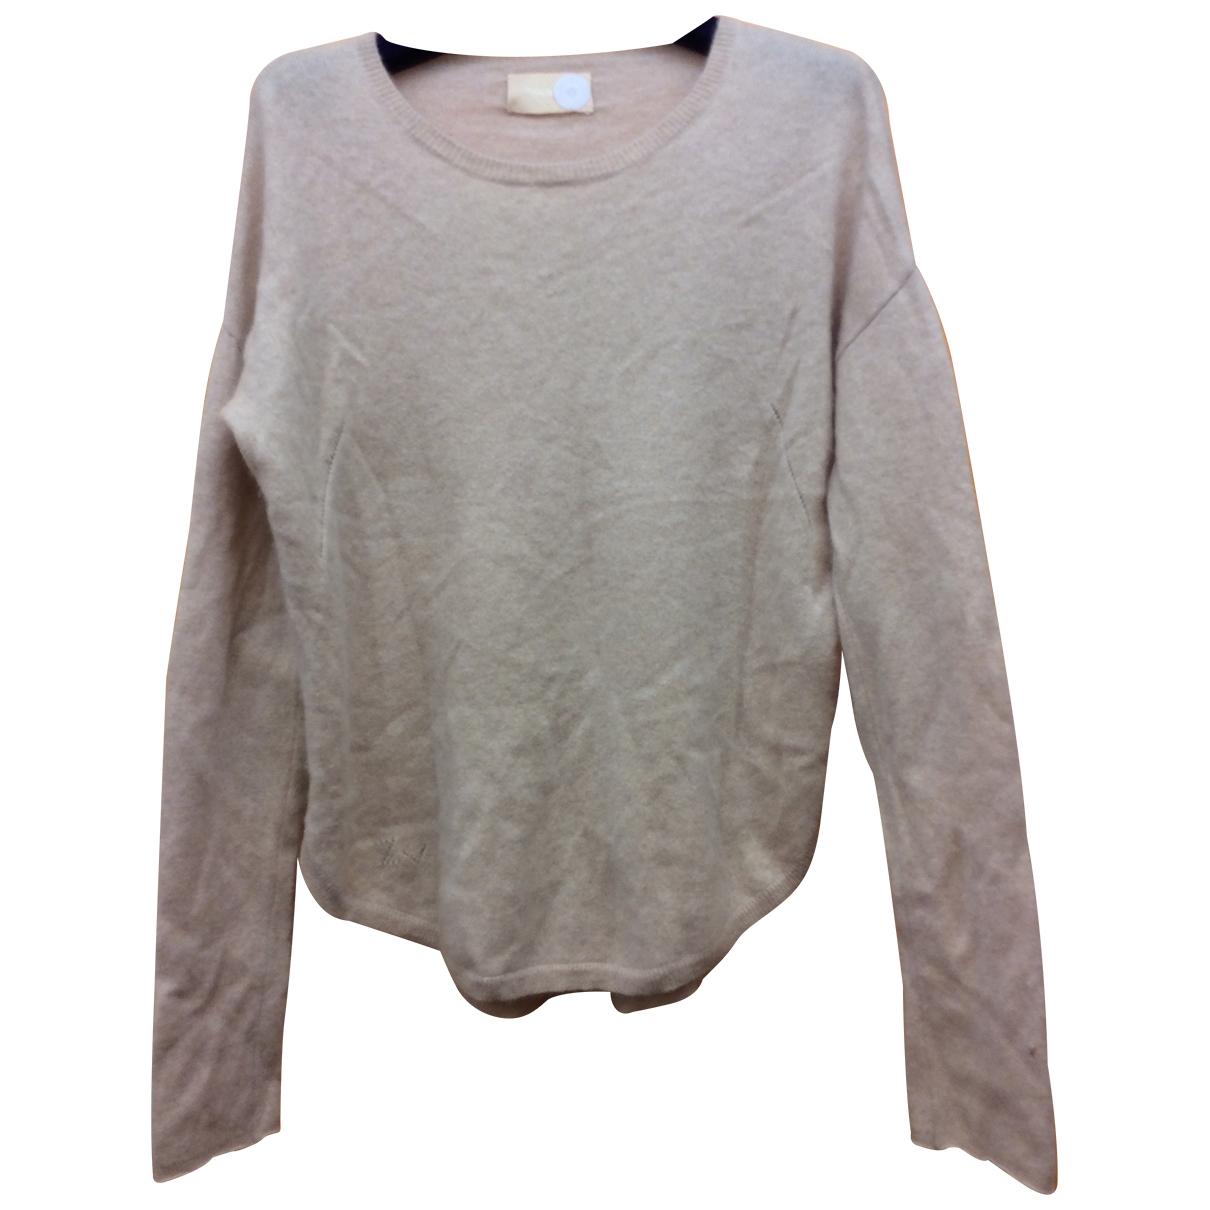 Zadig & Voltaire \N Grey Cashmere Knitwear for Women S International